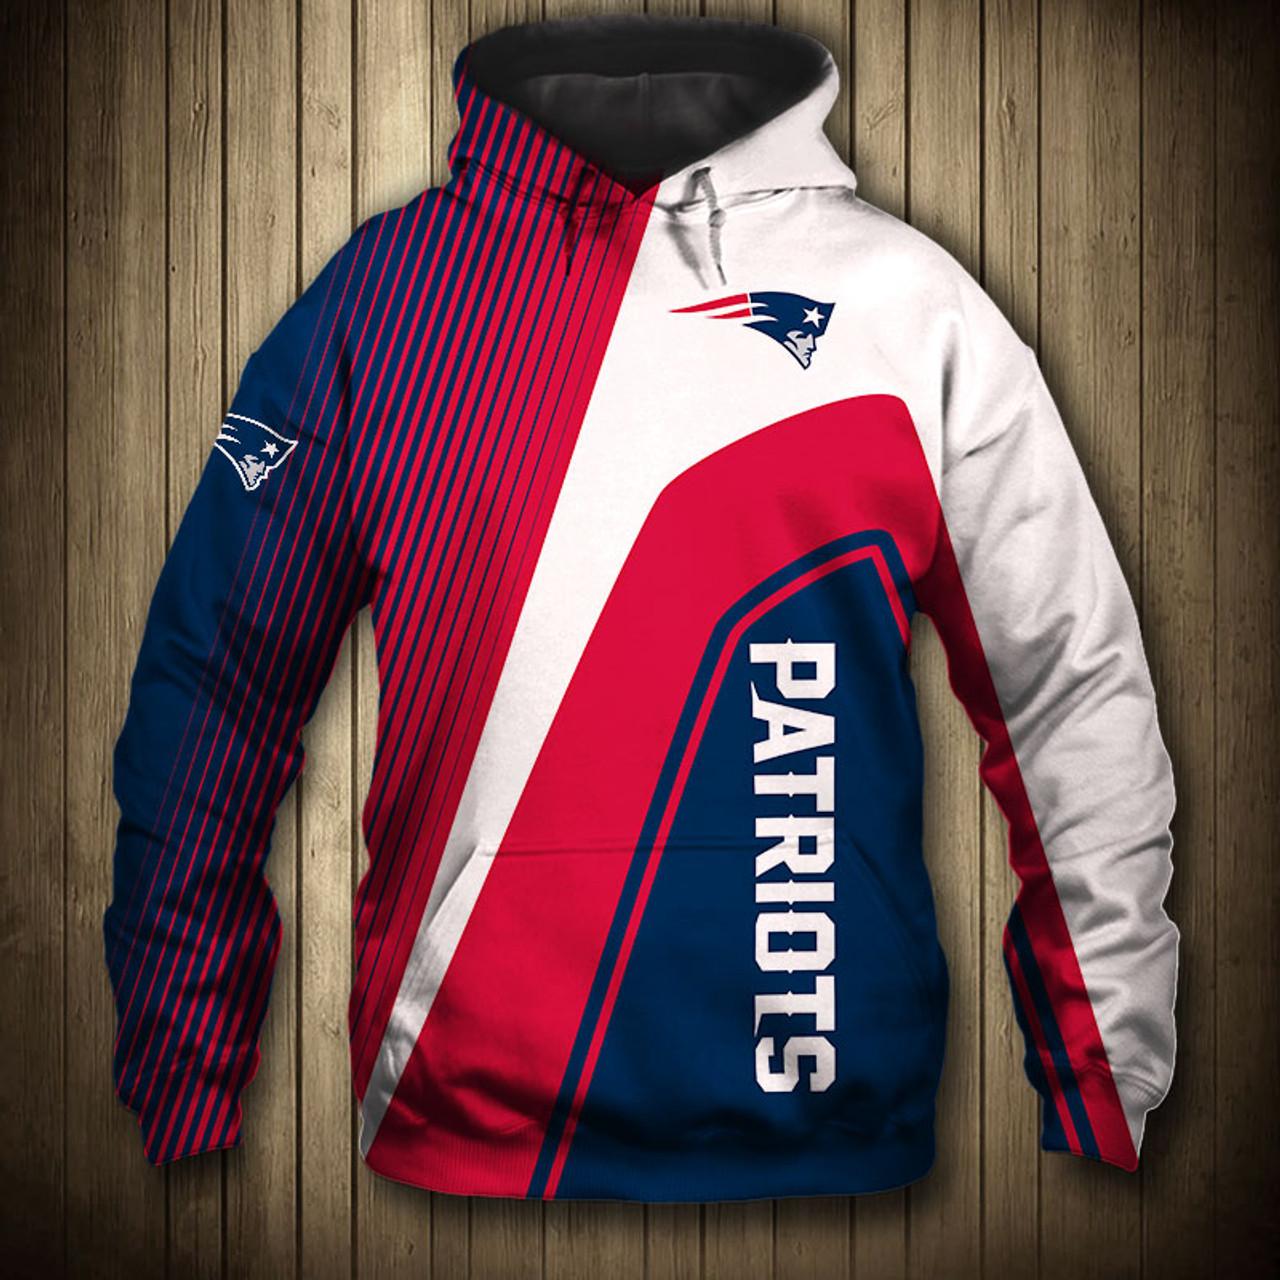 new england patriots red sweatshirt